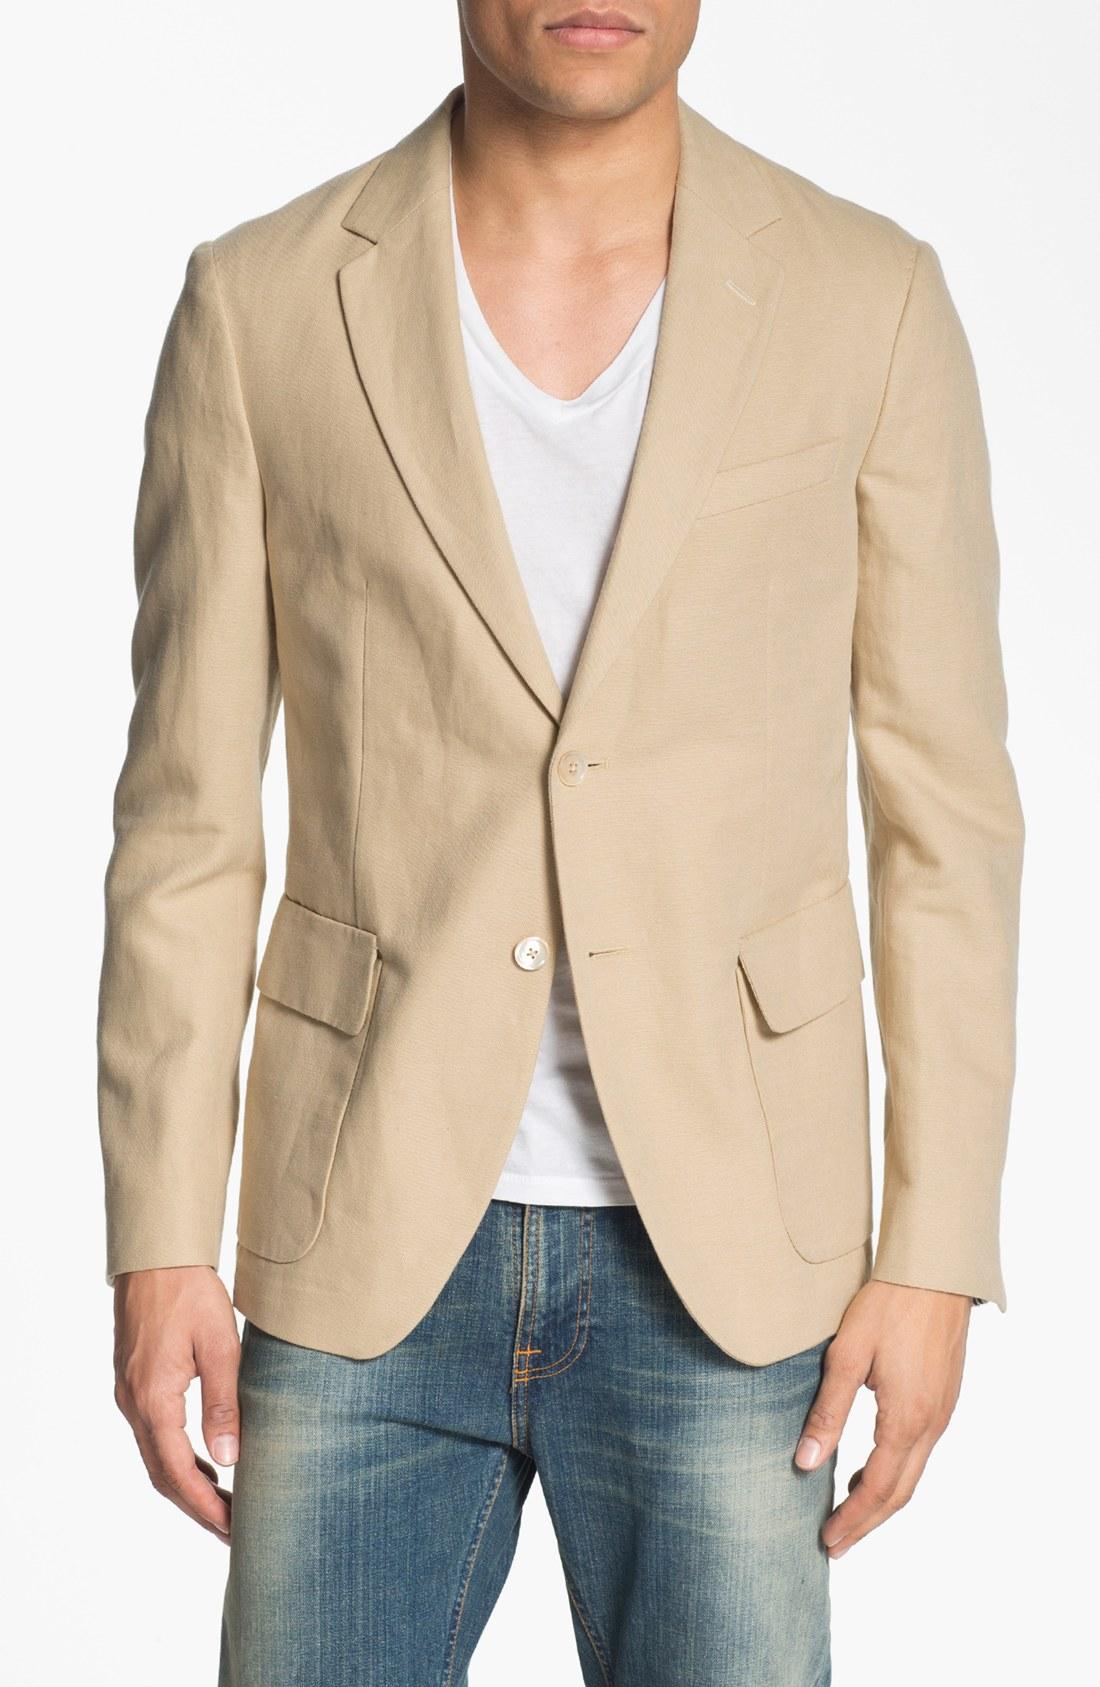 Gant Rugger Deconstructed Linen Blend Blazer In Beige For